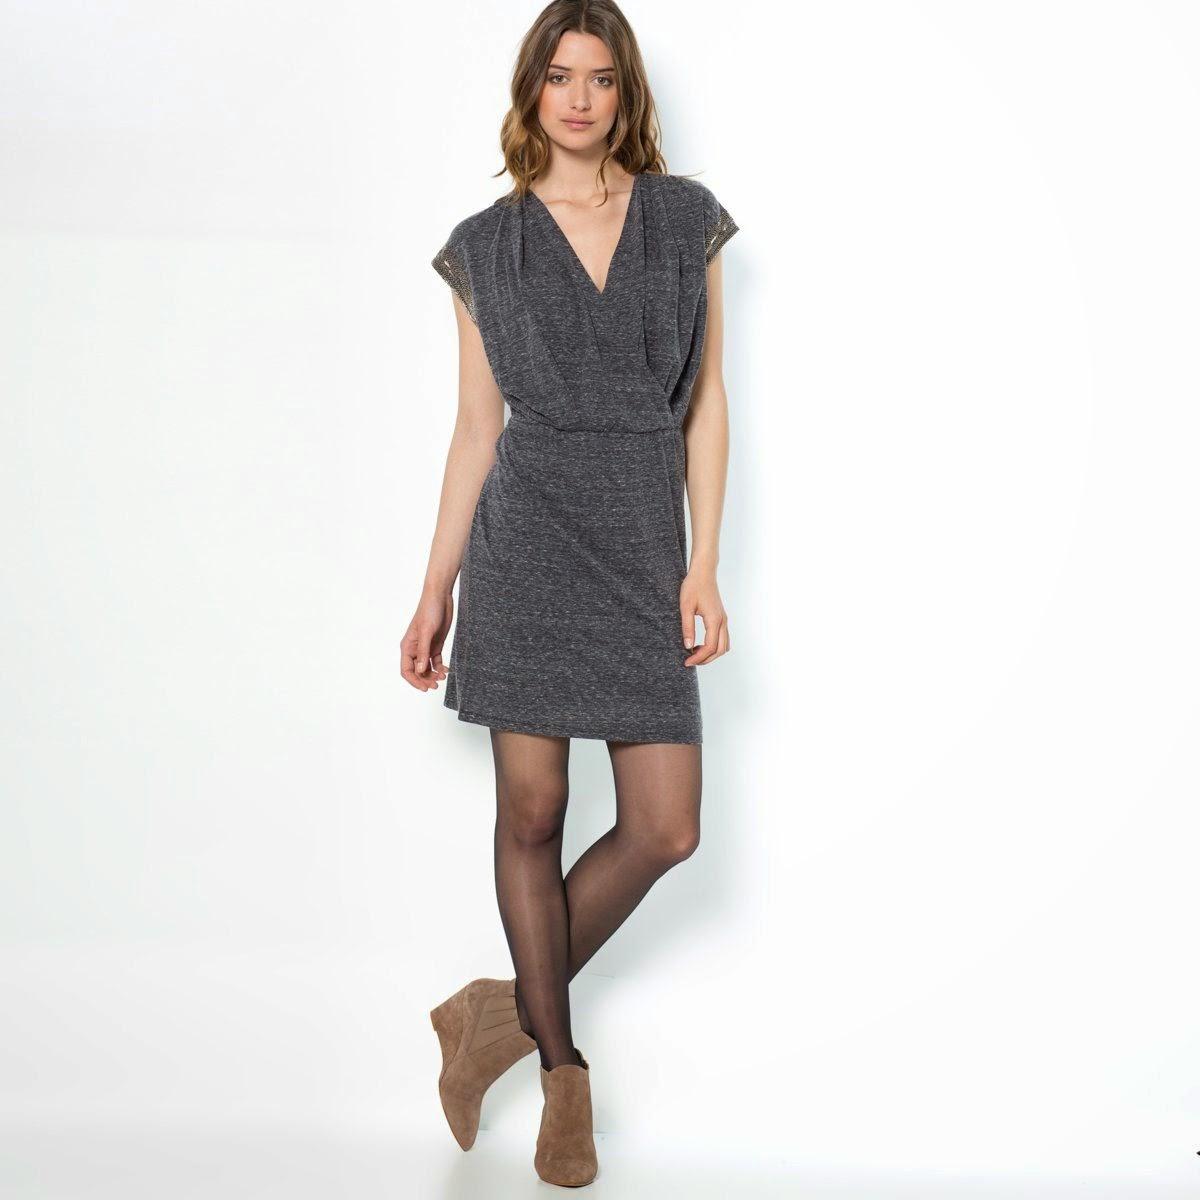 14c74c2c1feb Γυναικεία Φορέματα   Γυναικεία κοντά φορέματα